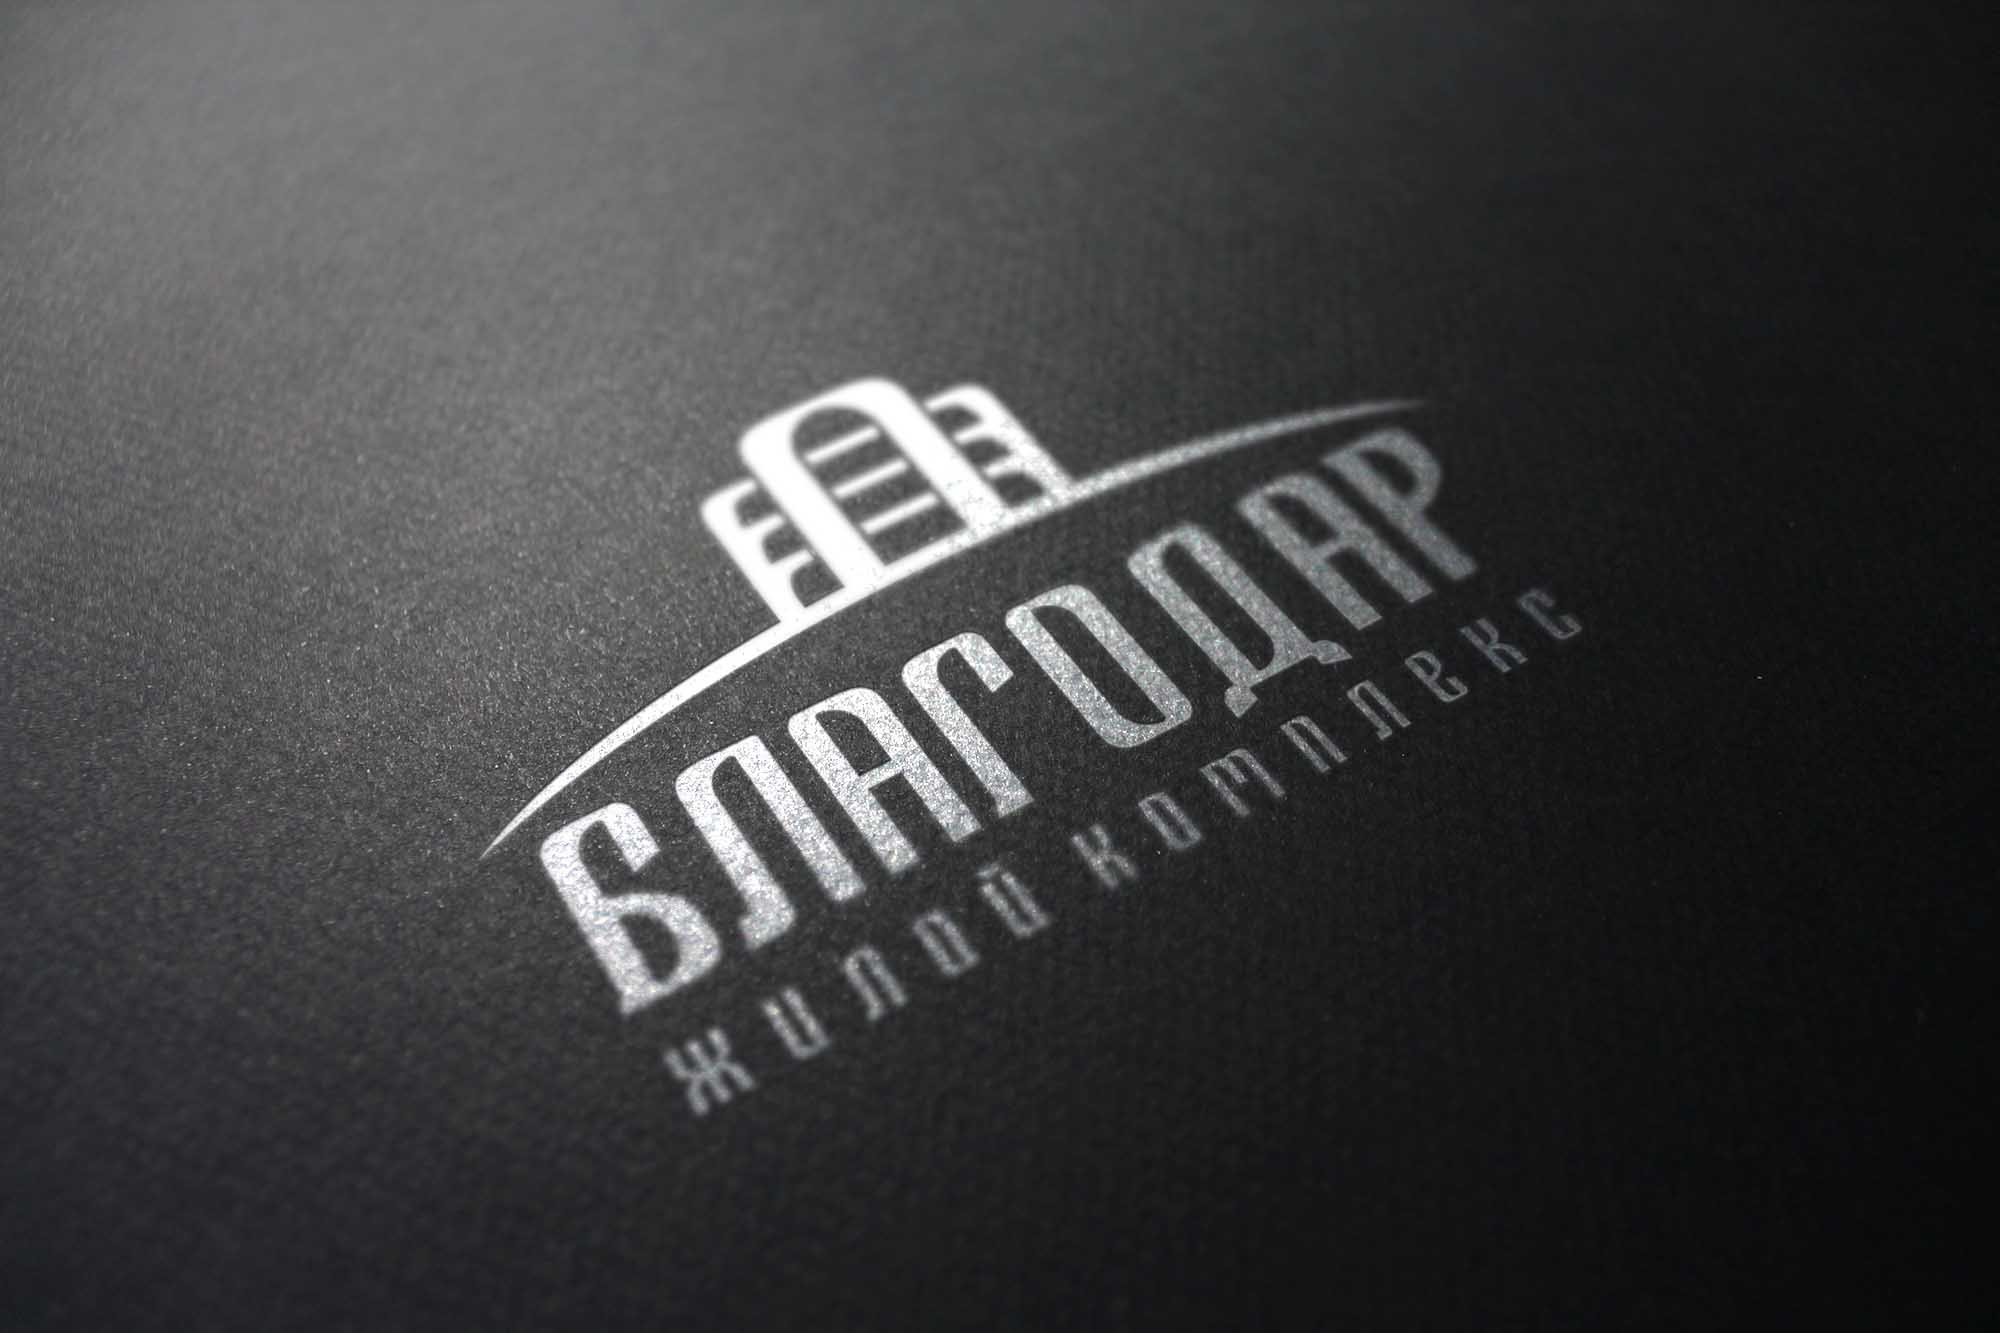 Разработка логотипа и фирменный стиль фото f_8545970dfae66b01.jpg